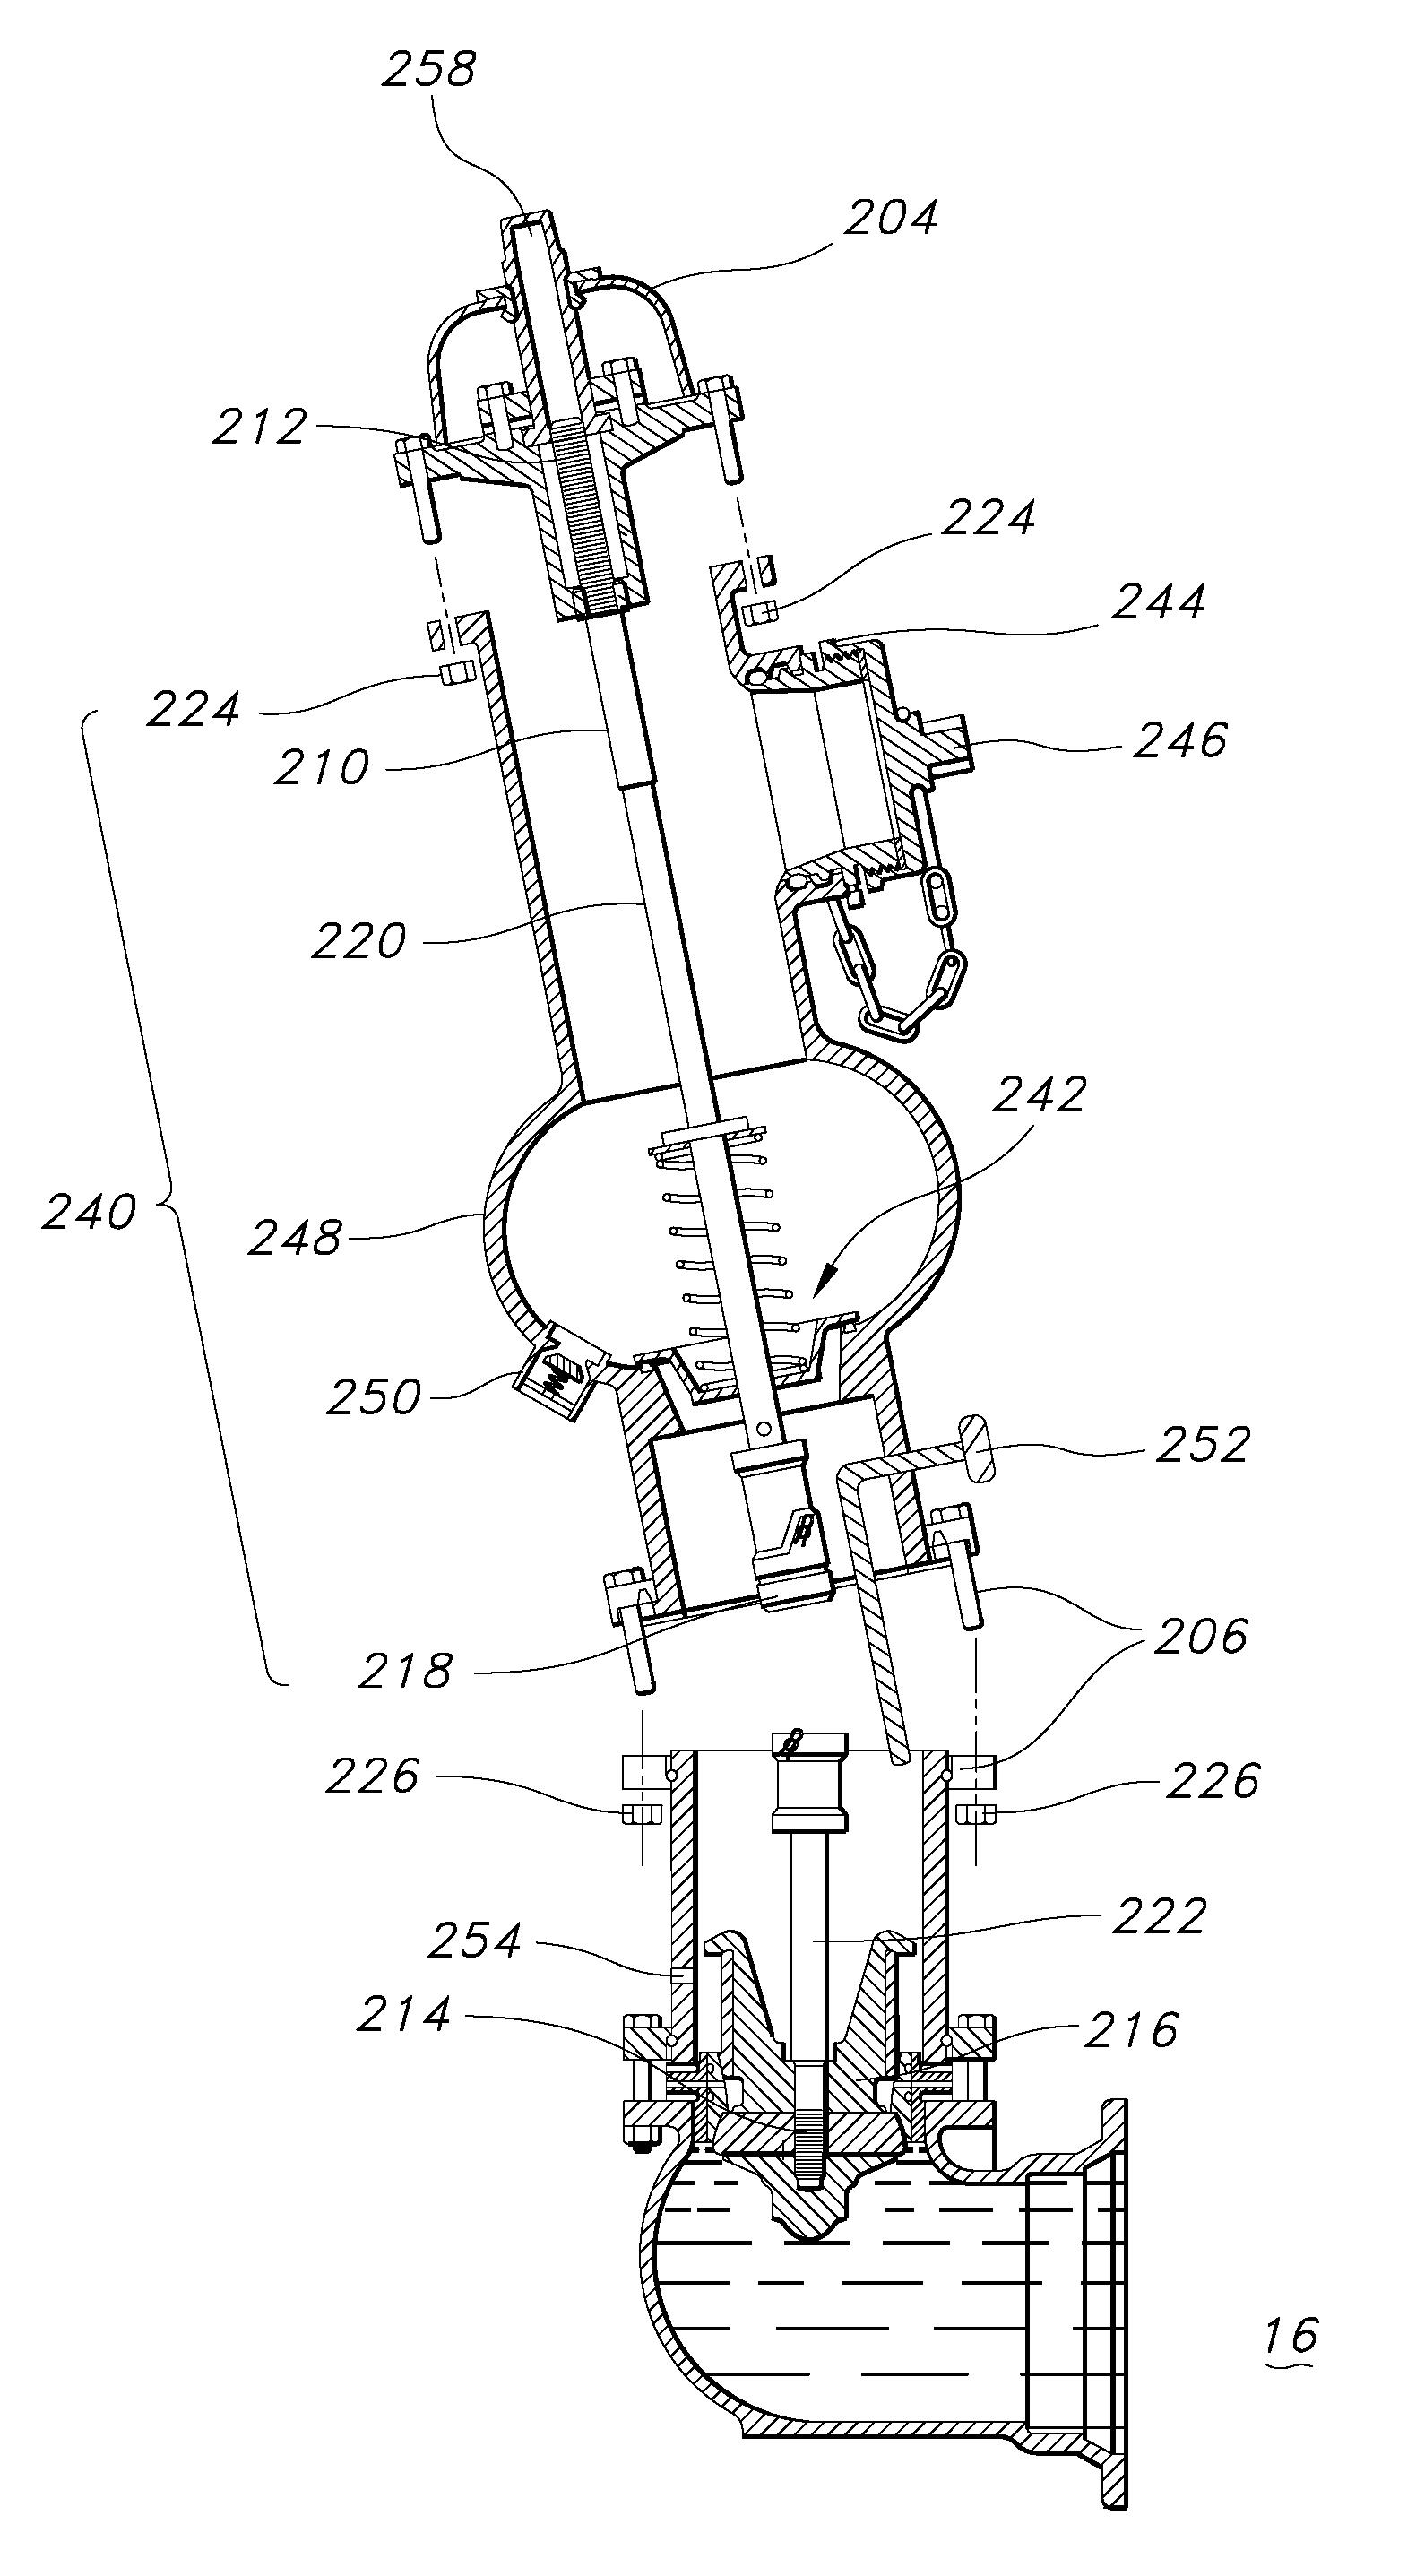 basic fire hydrant diagram 2008 dodge magnum radio wiring patent us7775231 retrofitting a with